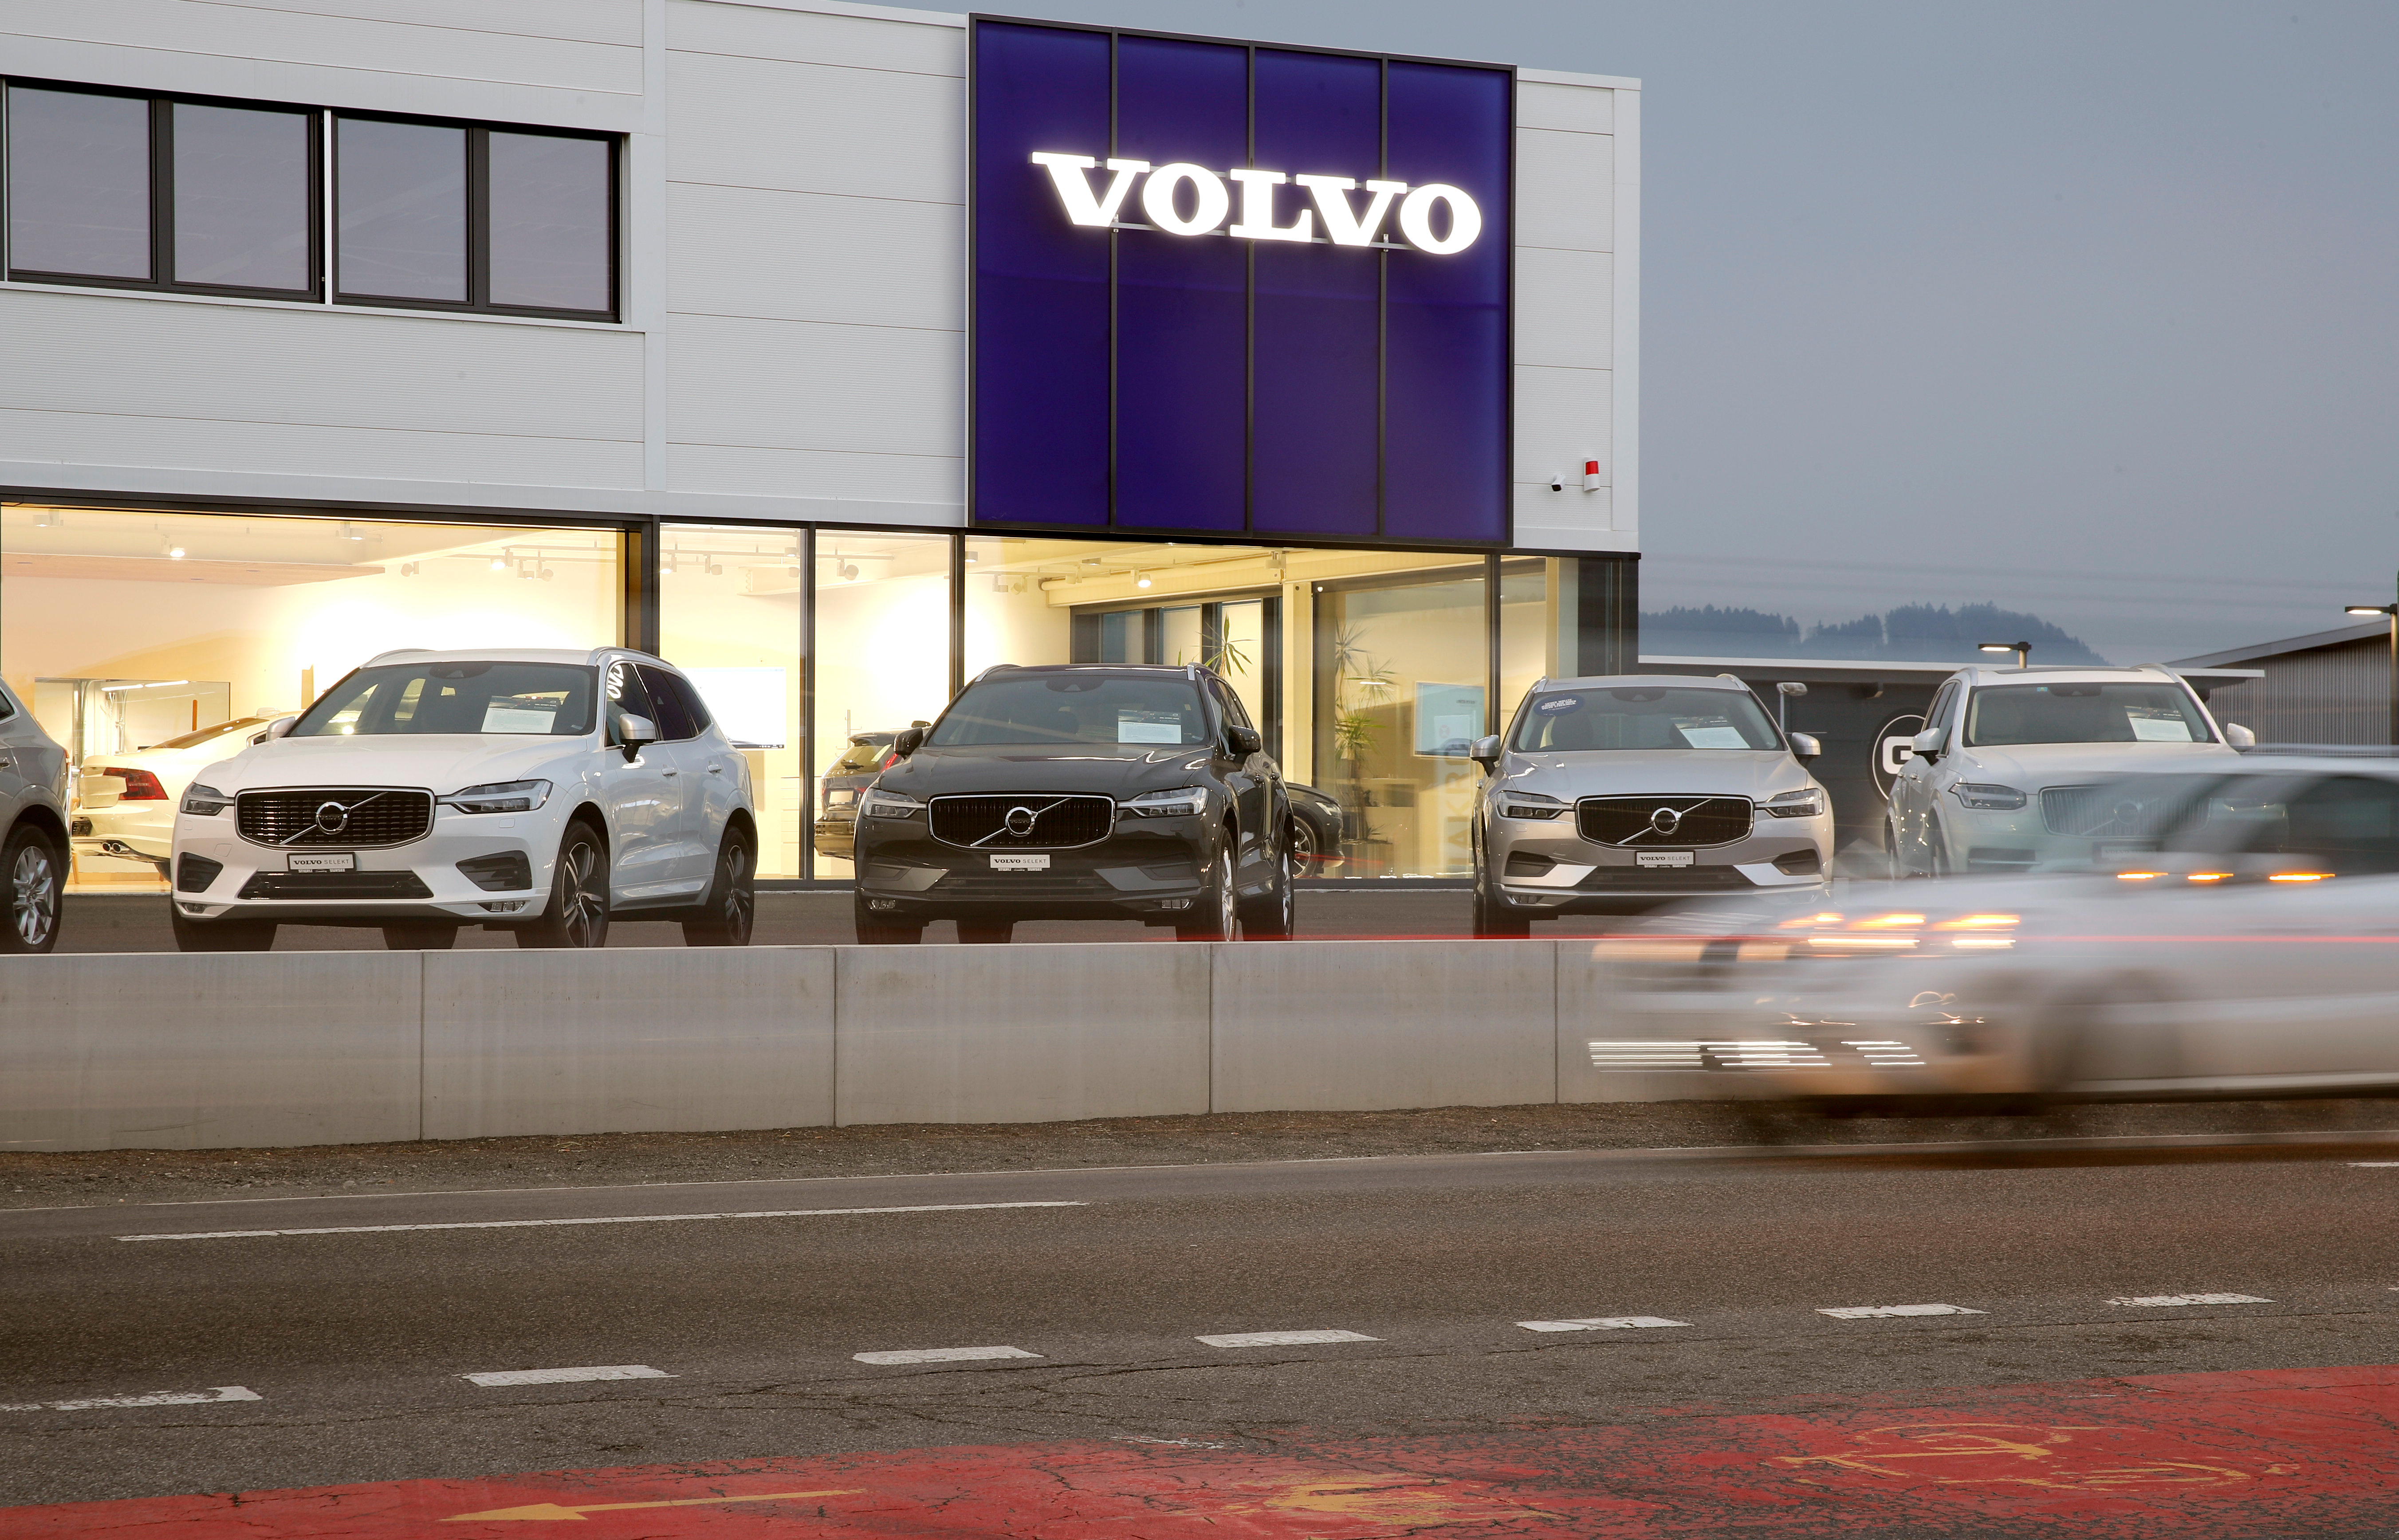 Volvo cars are seen in St. Erhard, Switzerland, April 11, 2019. REUTERS/Arnd Wiegmann